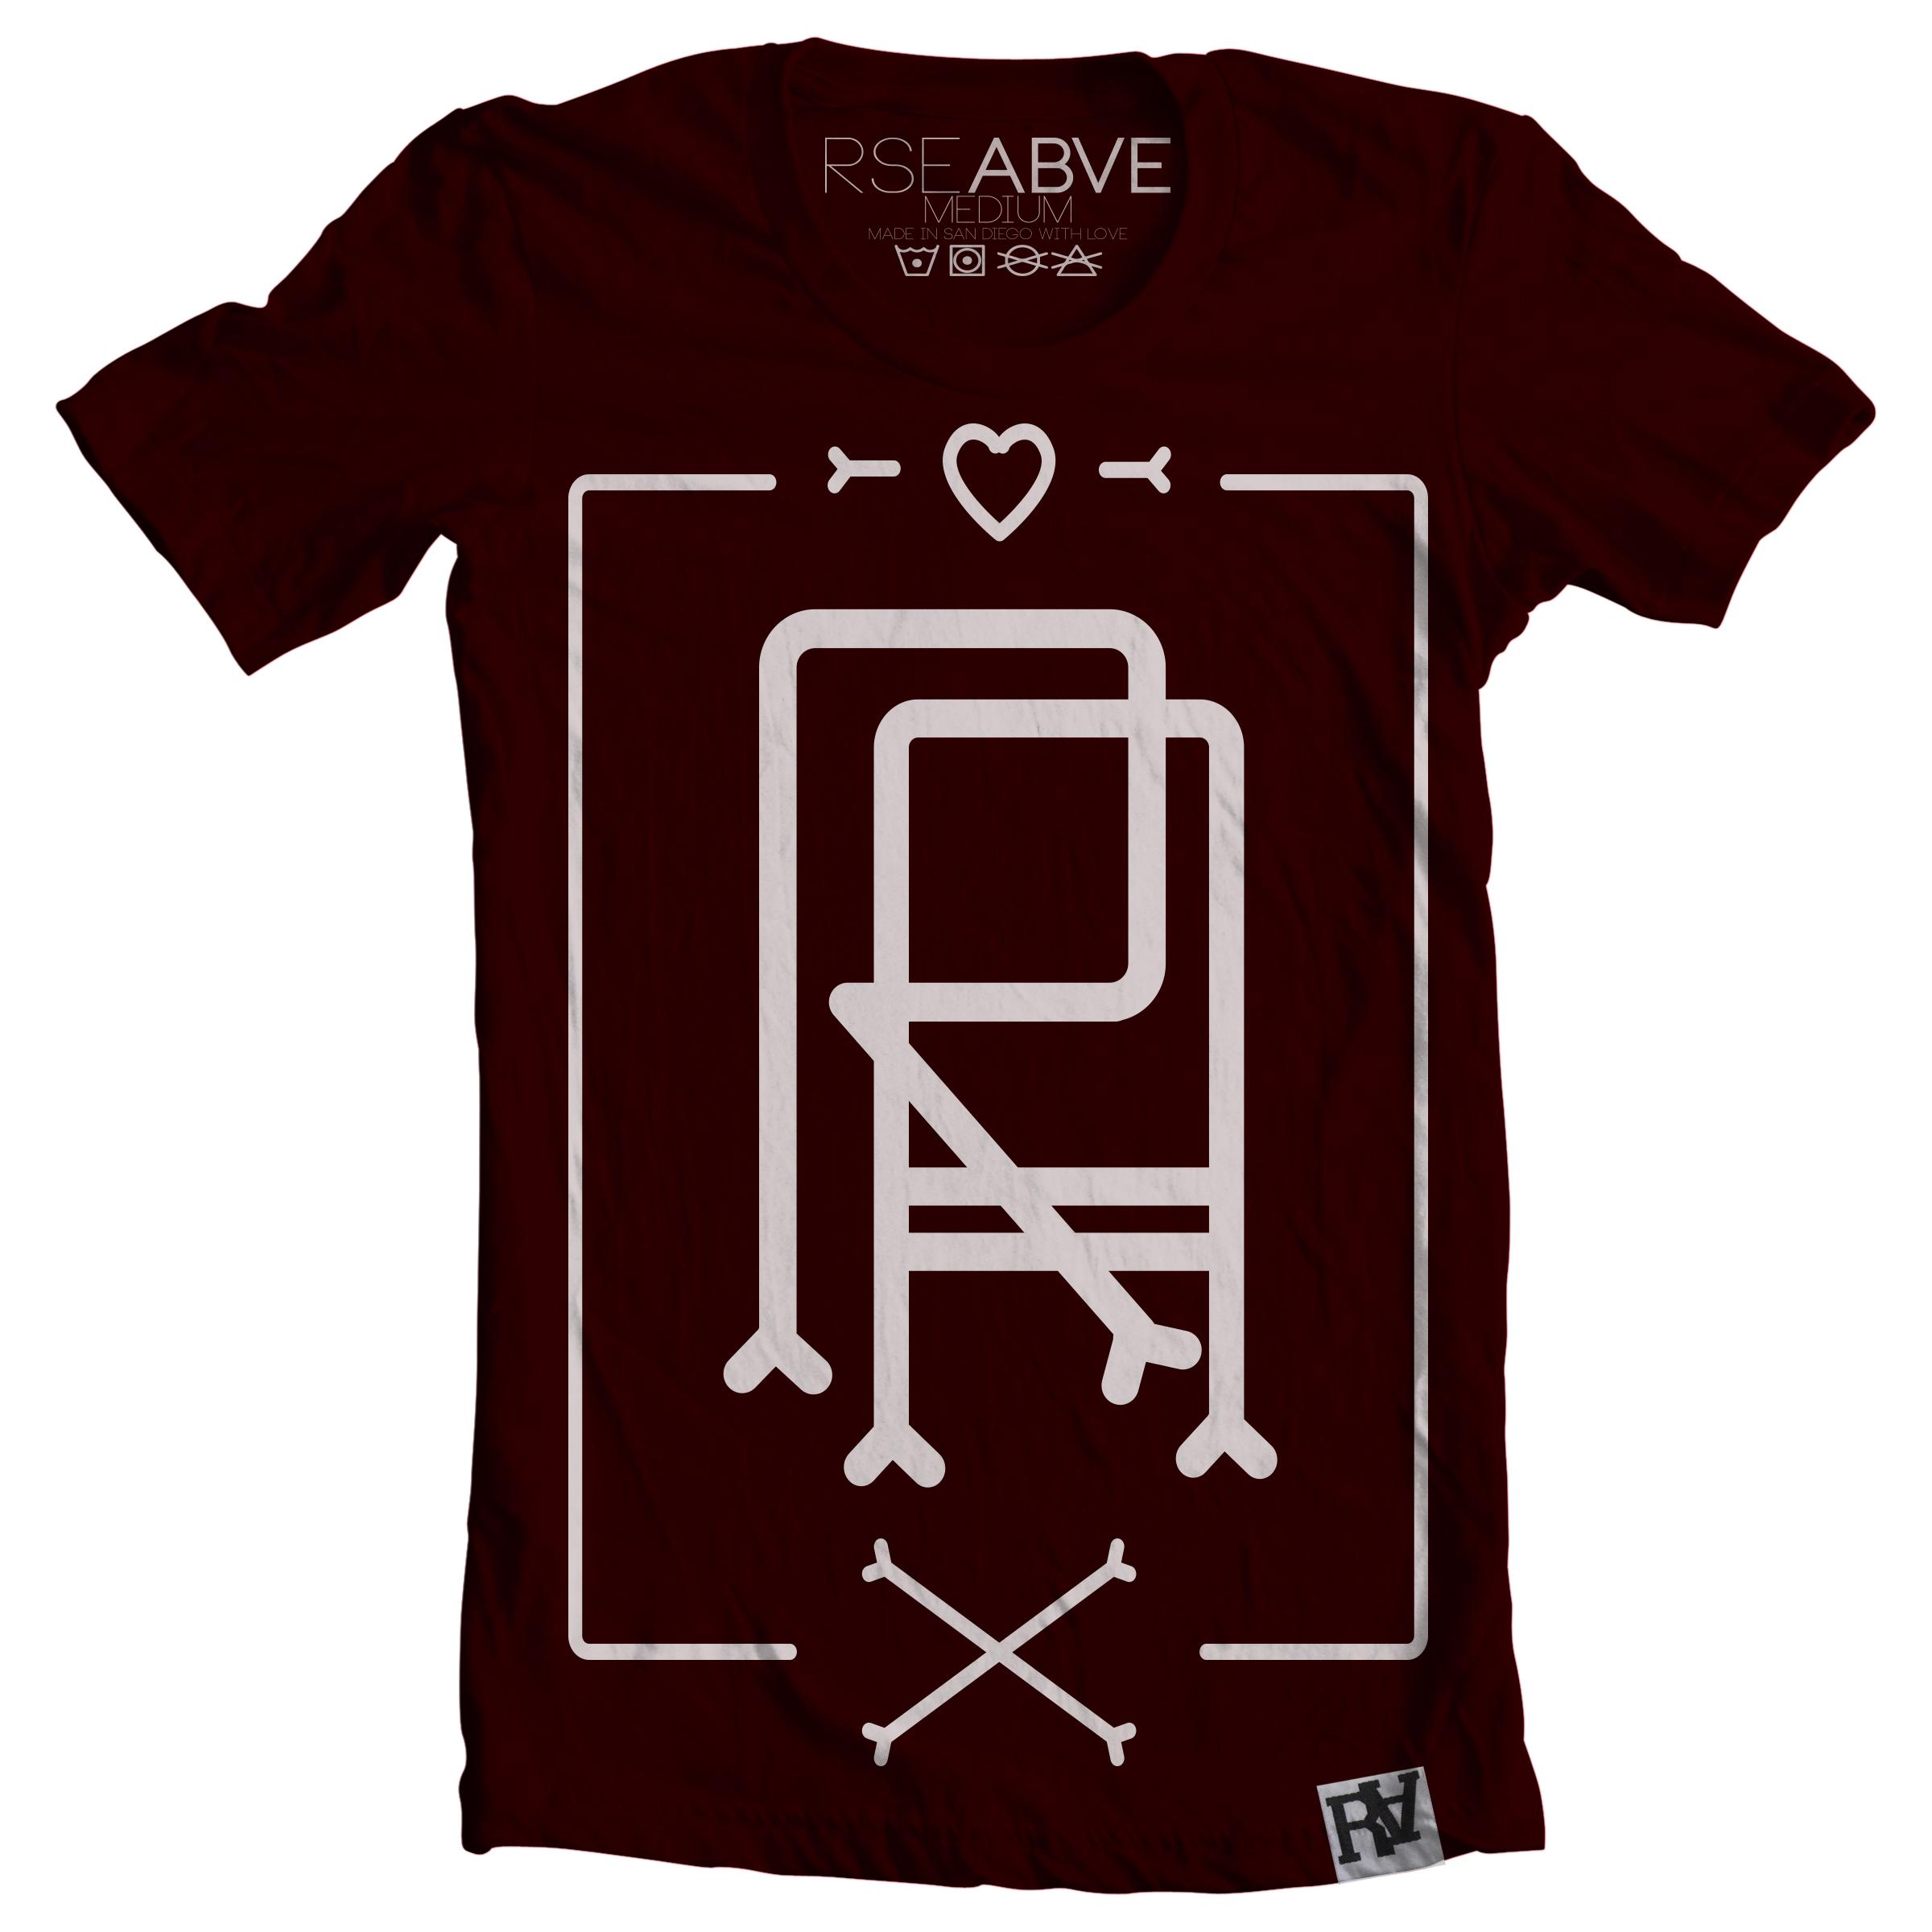 Heartbreaker clothing store